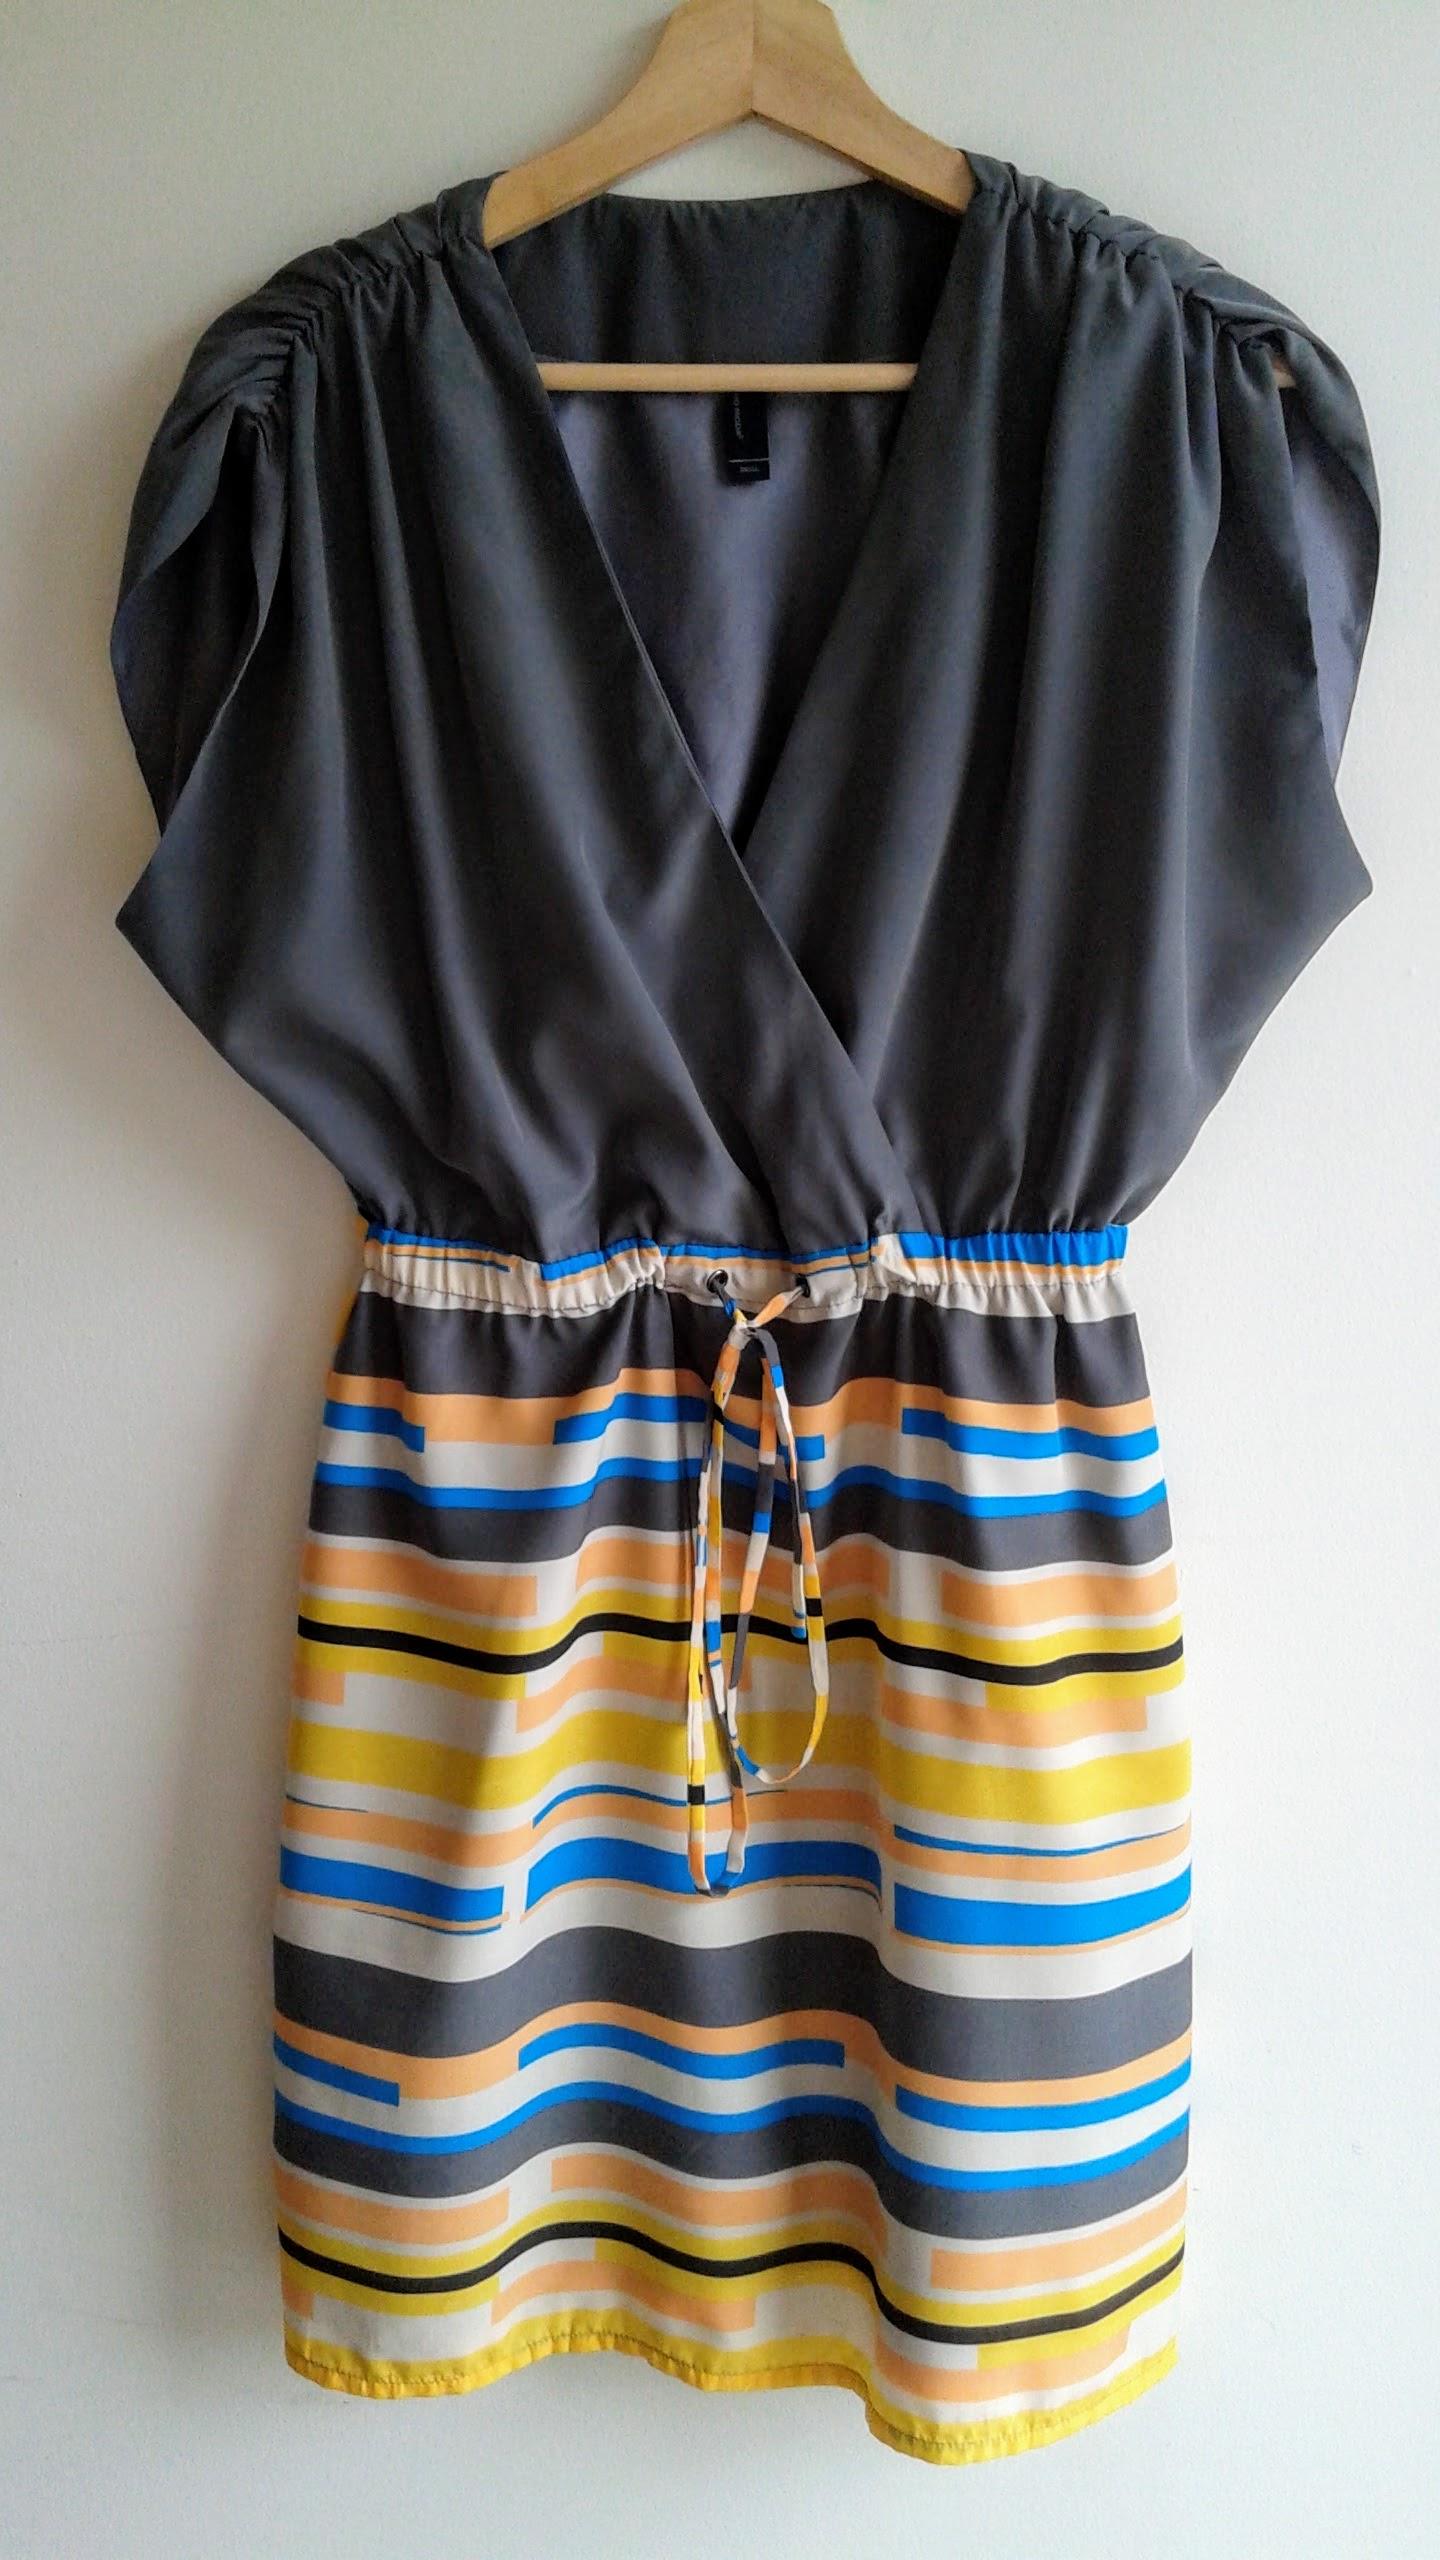 Vero Moda dress; Size S, $28